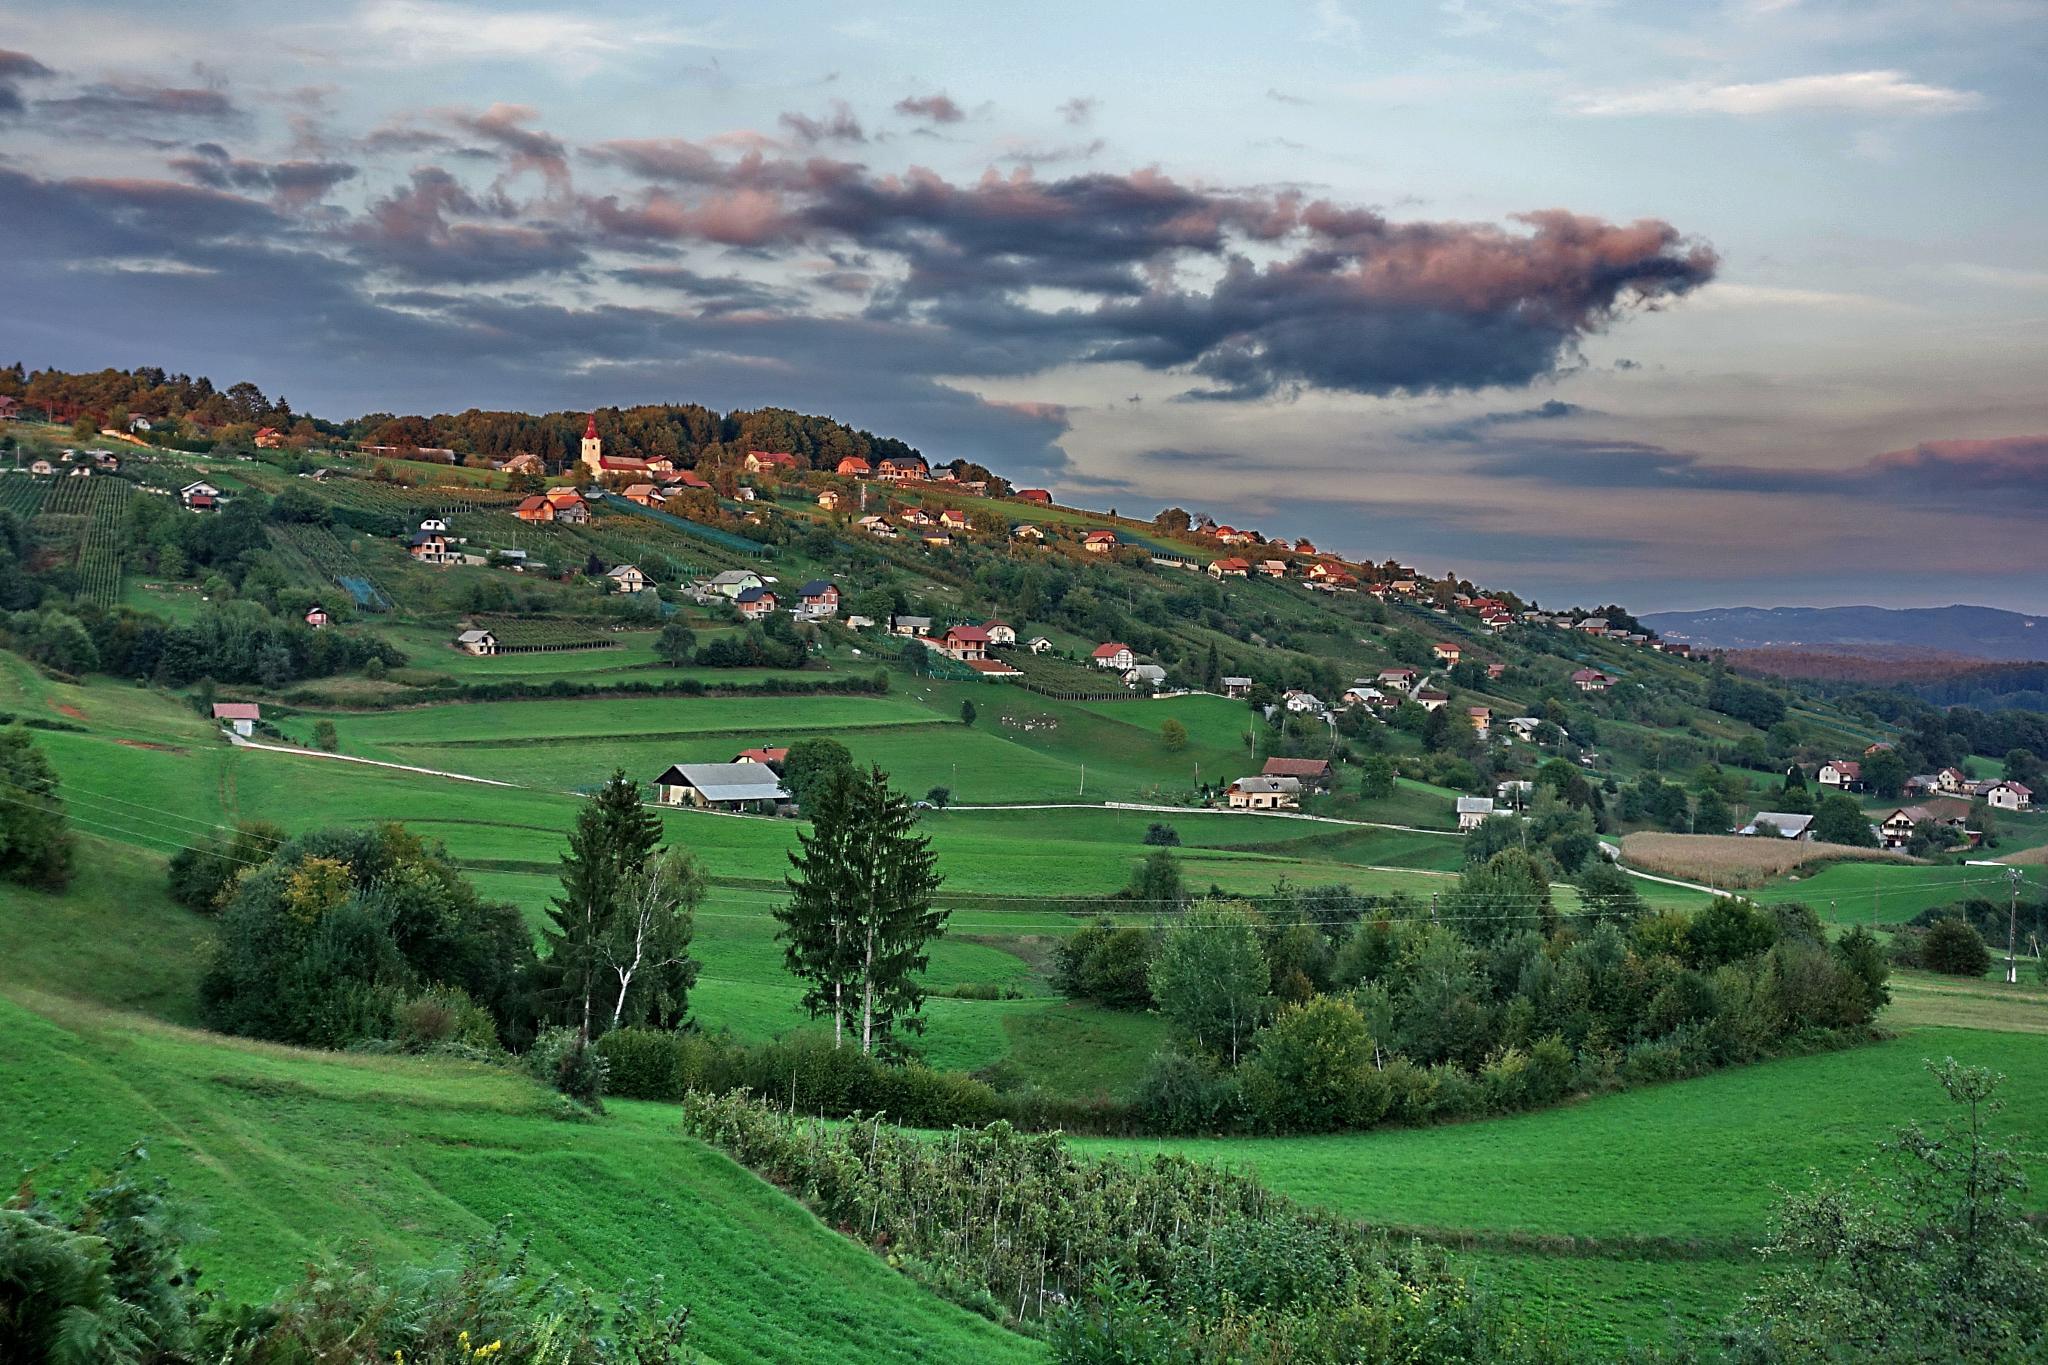 Dolenjska region, Slovenia by BernardaBizjak